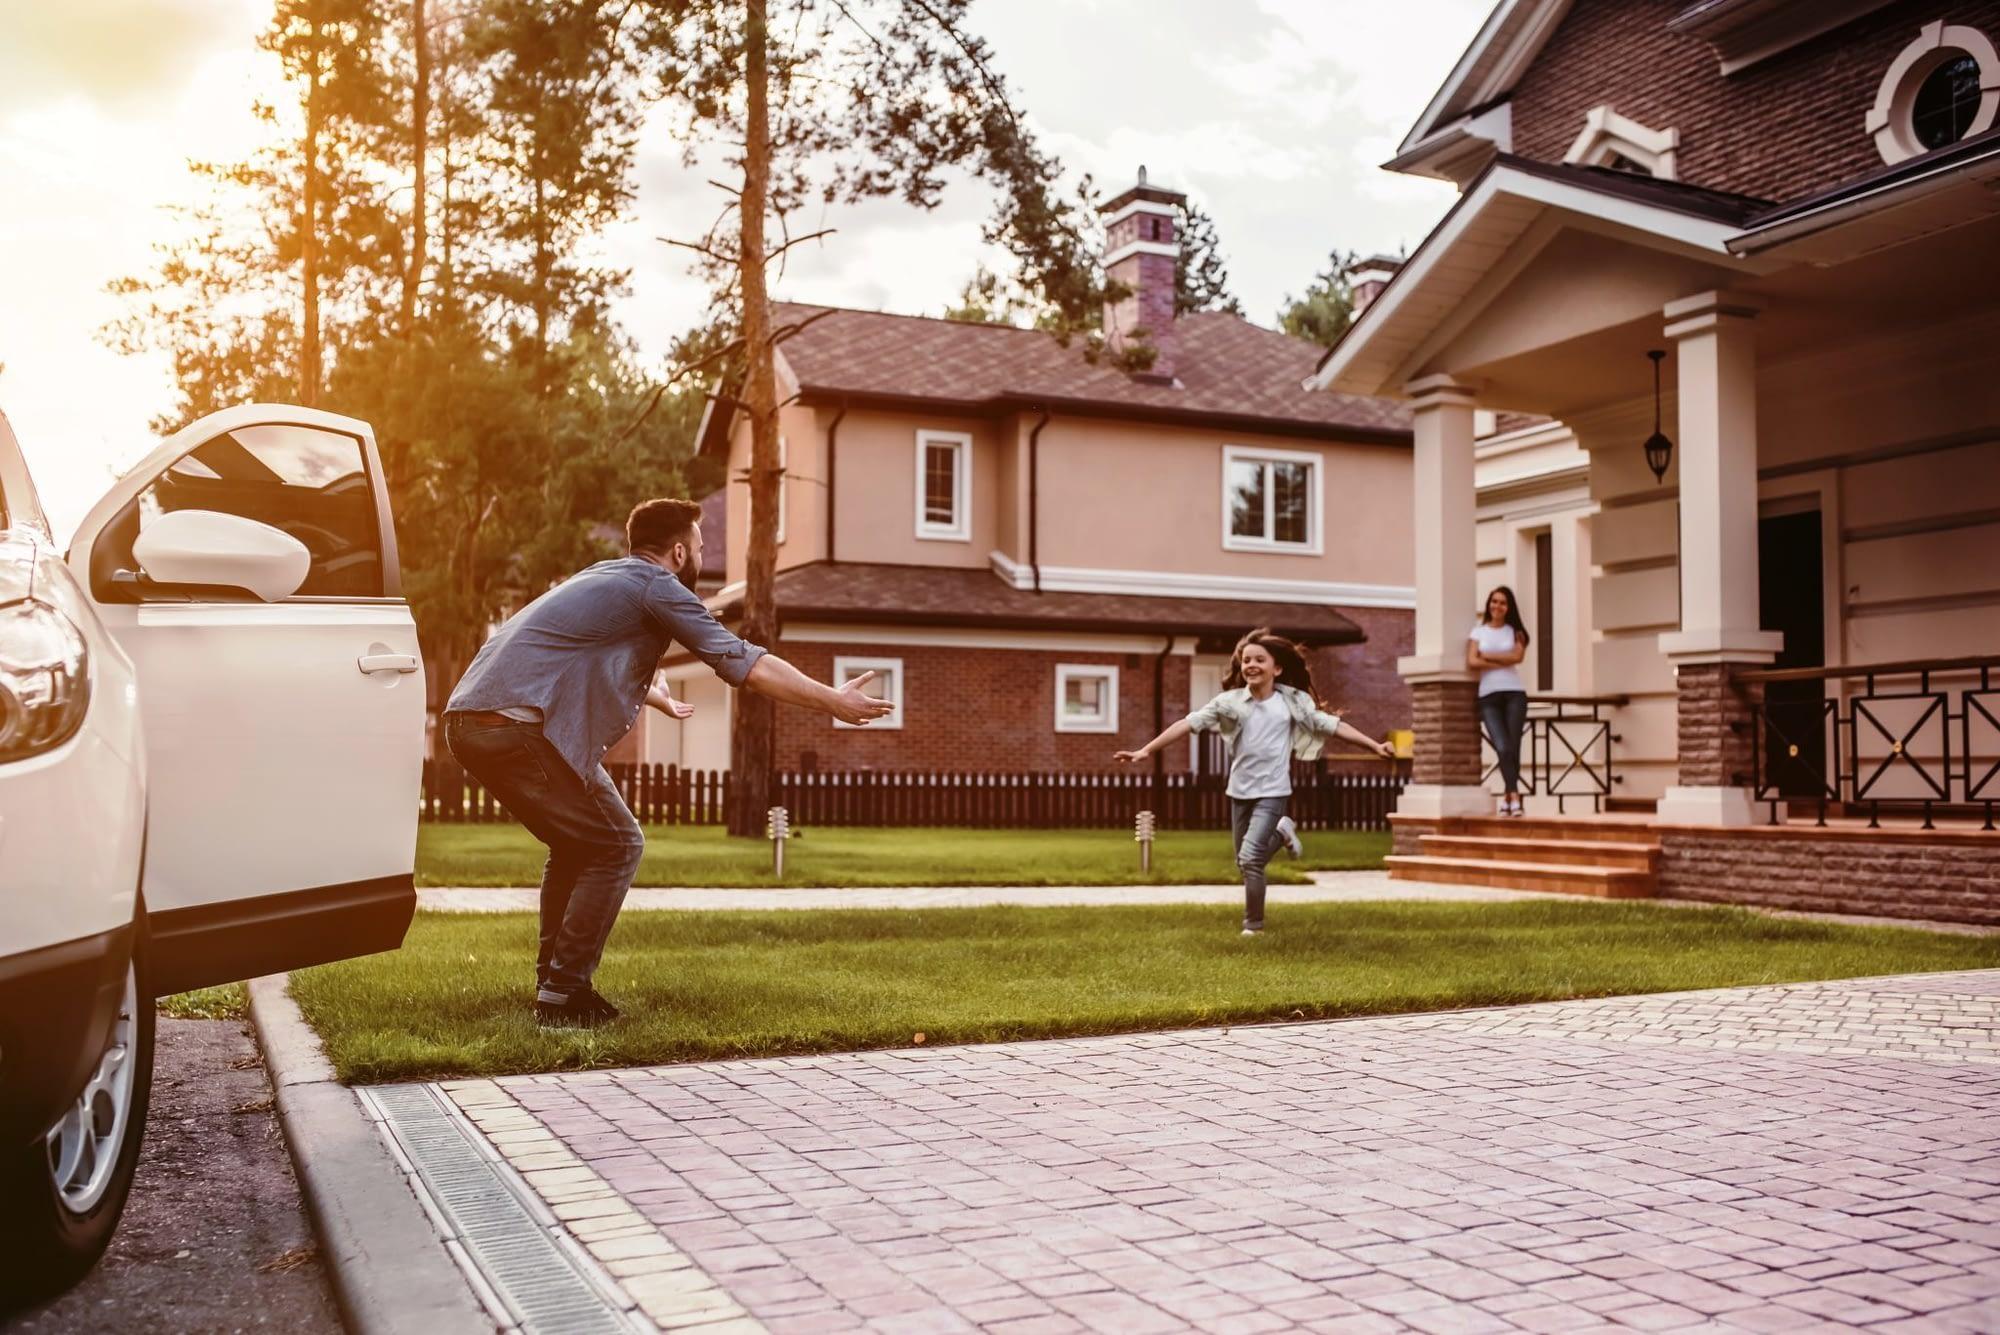 Local Missouri home insurance agent